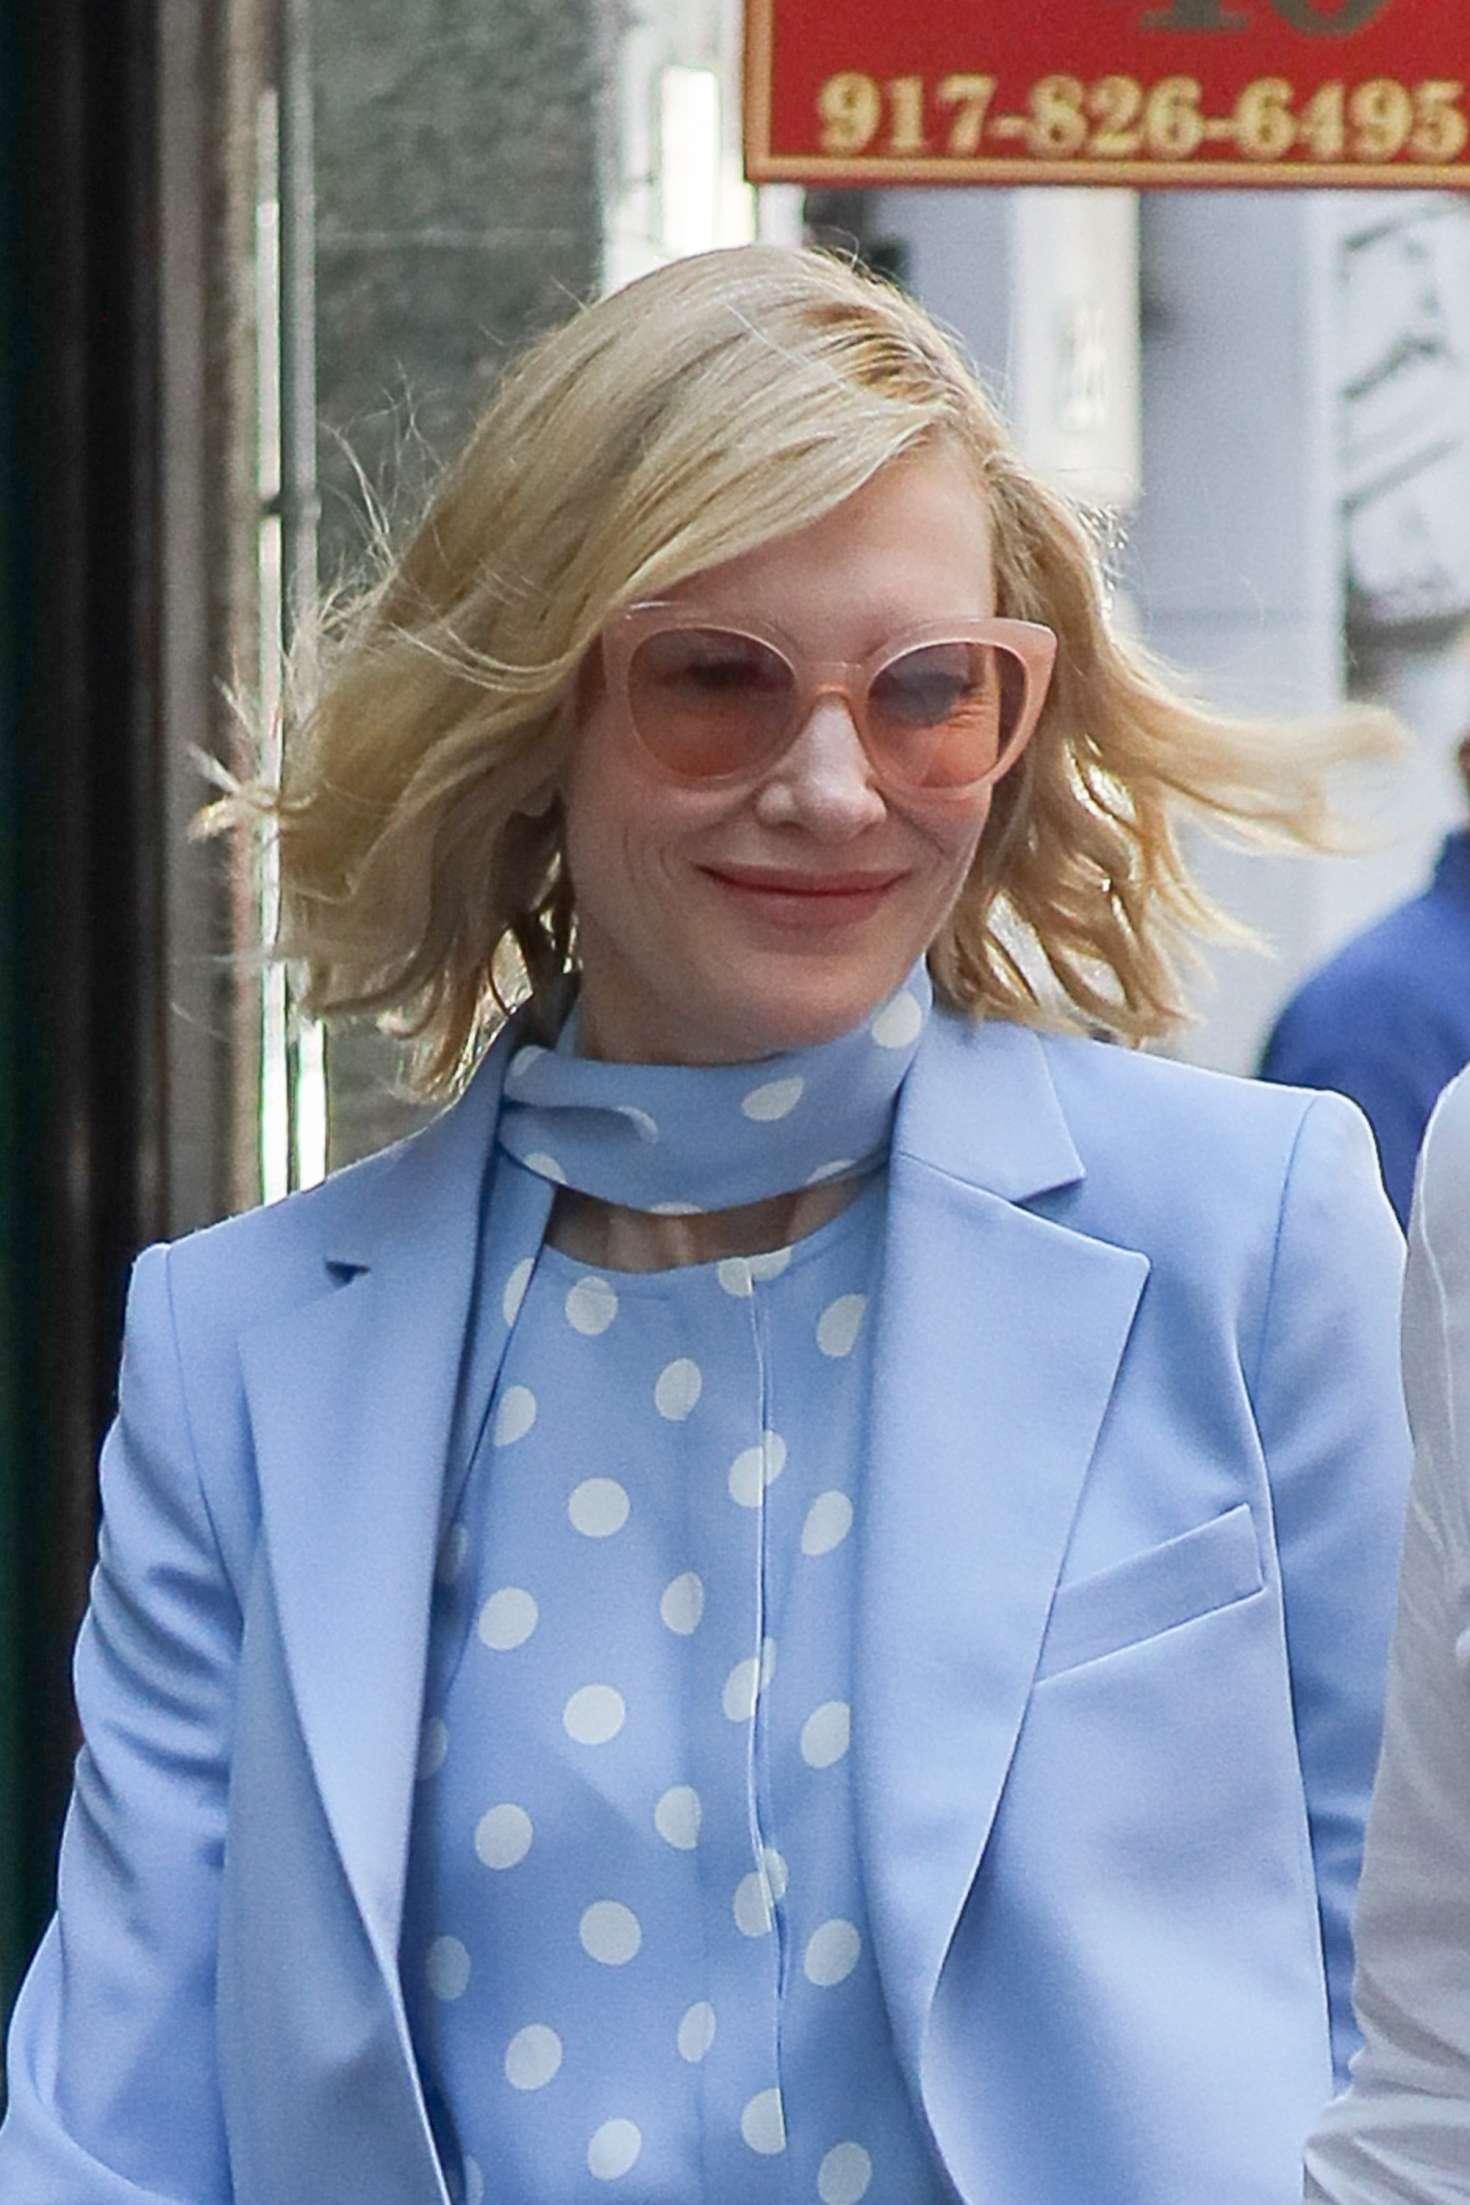 Cate Blanchett 2018 : Cate Blanchett in Light Blue outfit -04